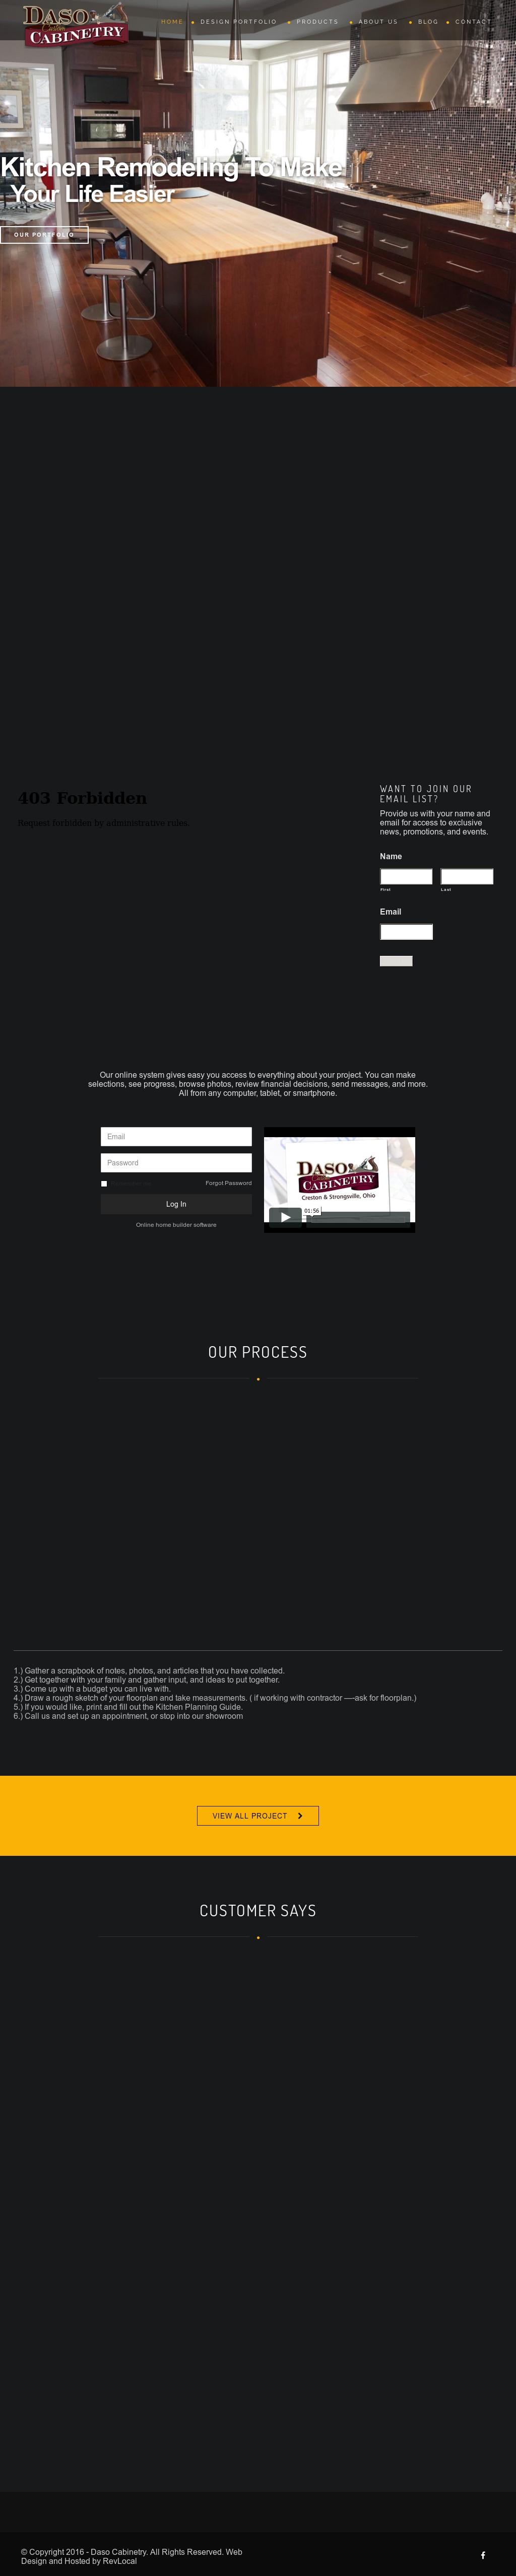 dasos custom cabinetry website history